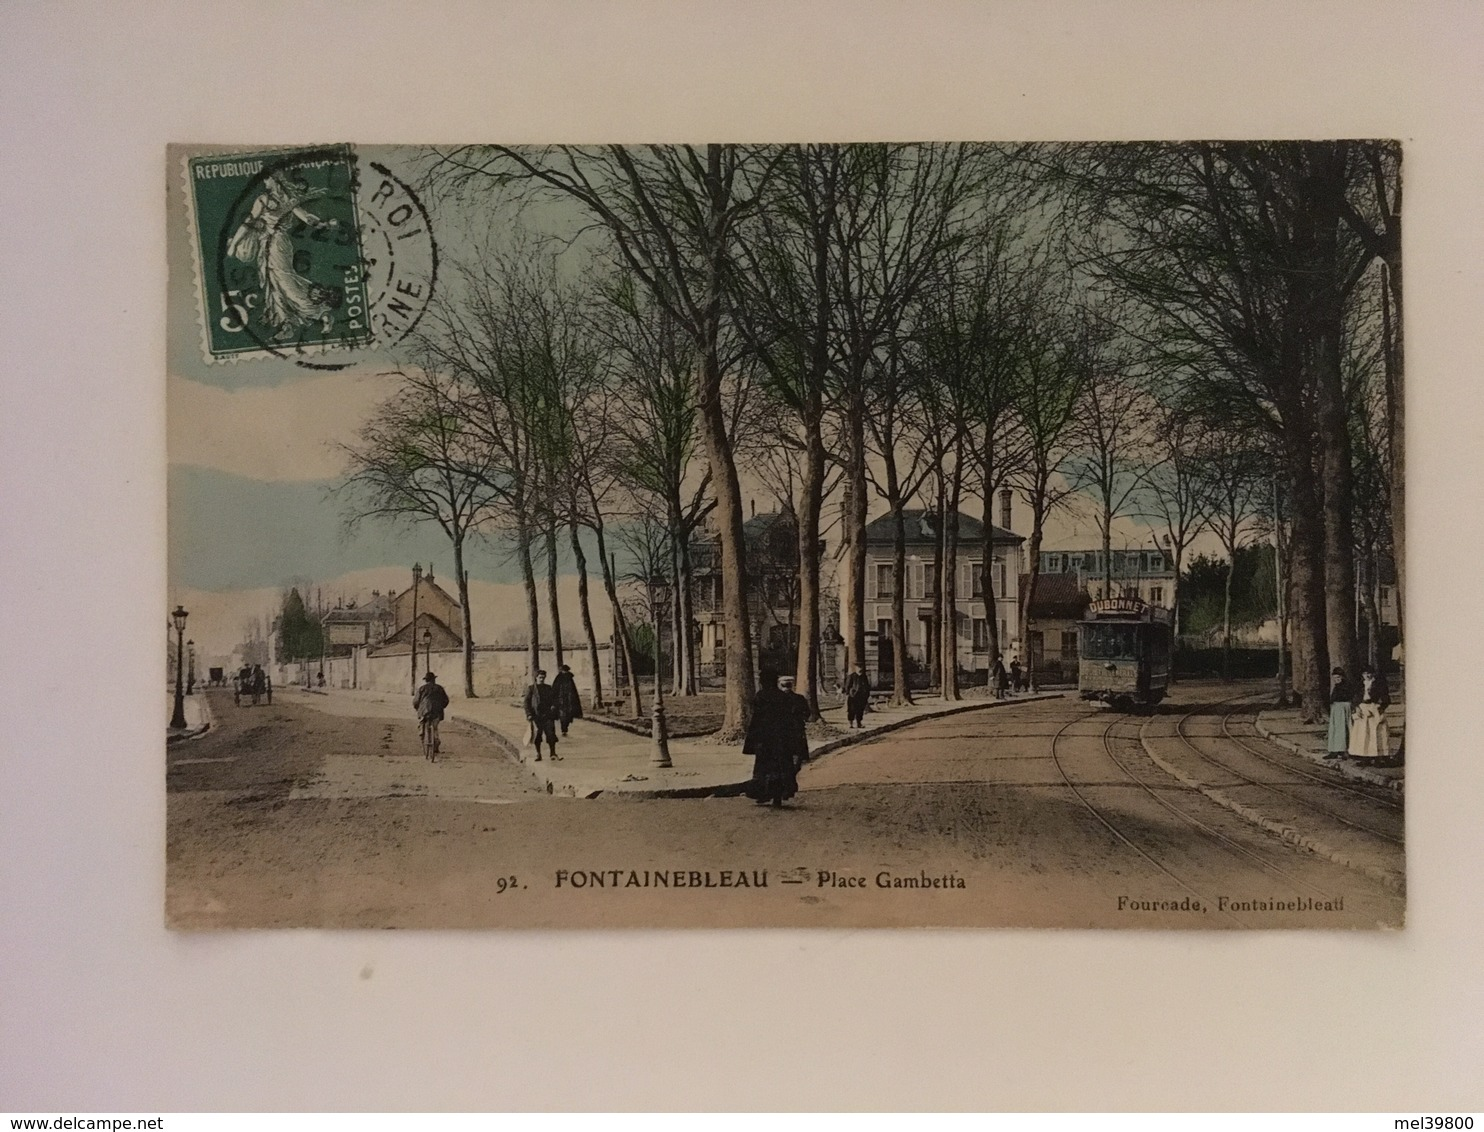 Fontainebleau - Place Gambetta - Fontainebleau